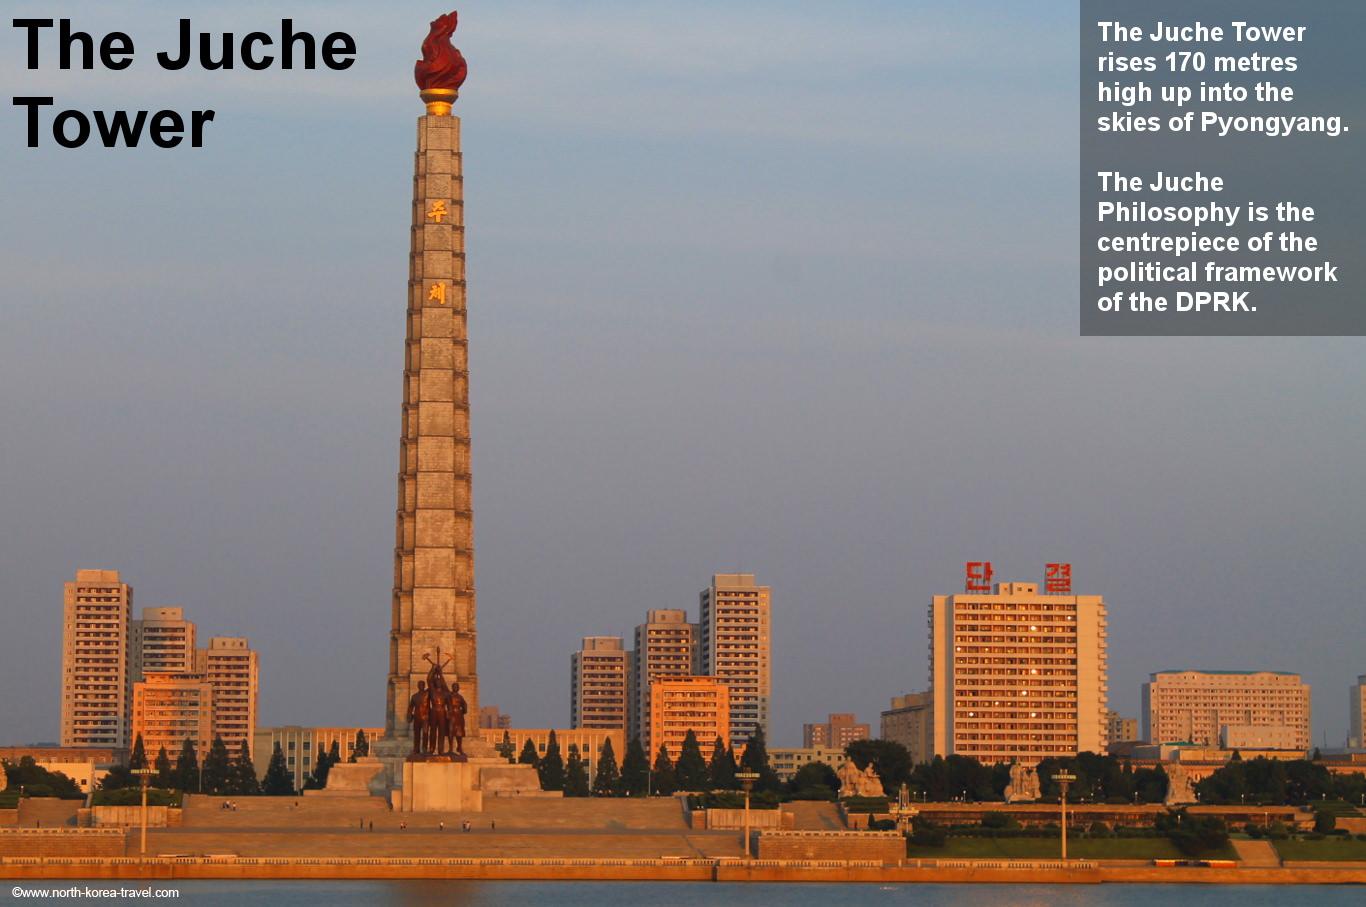 La torre Juche en Pyongyang, Corea del Norte